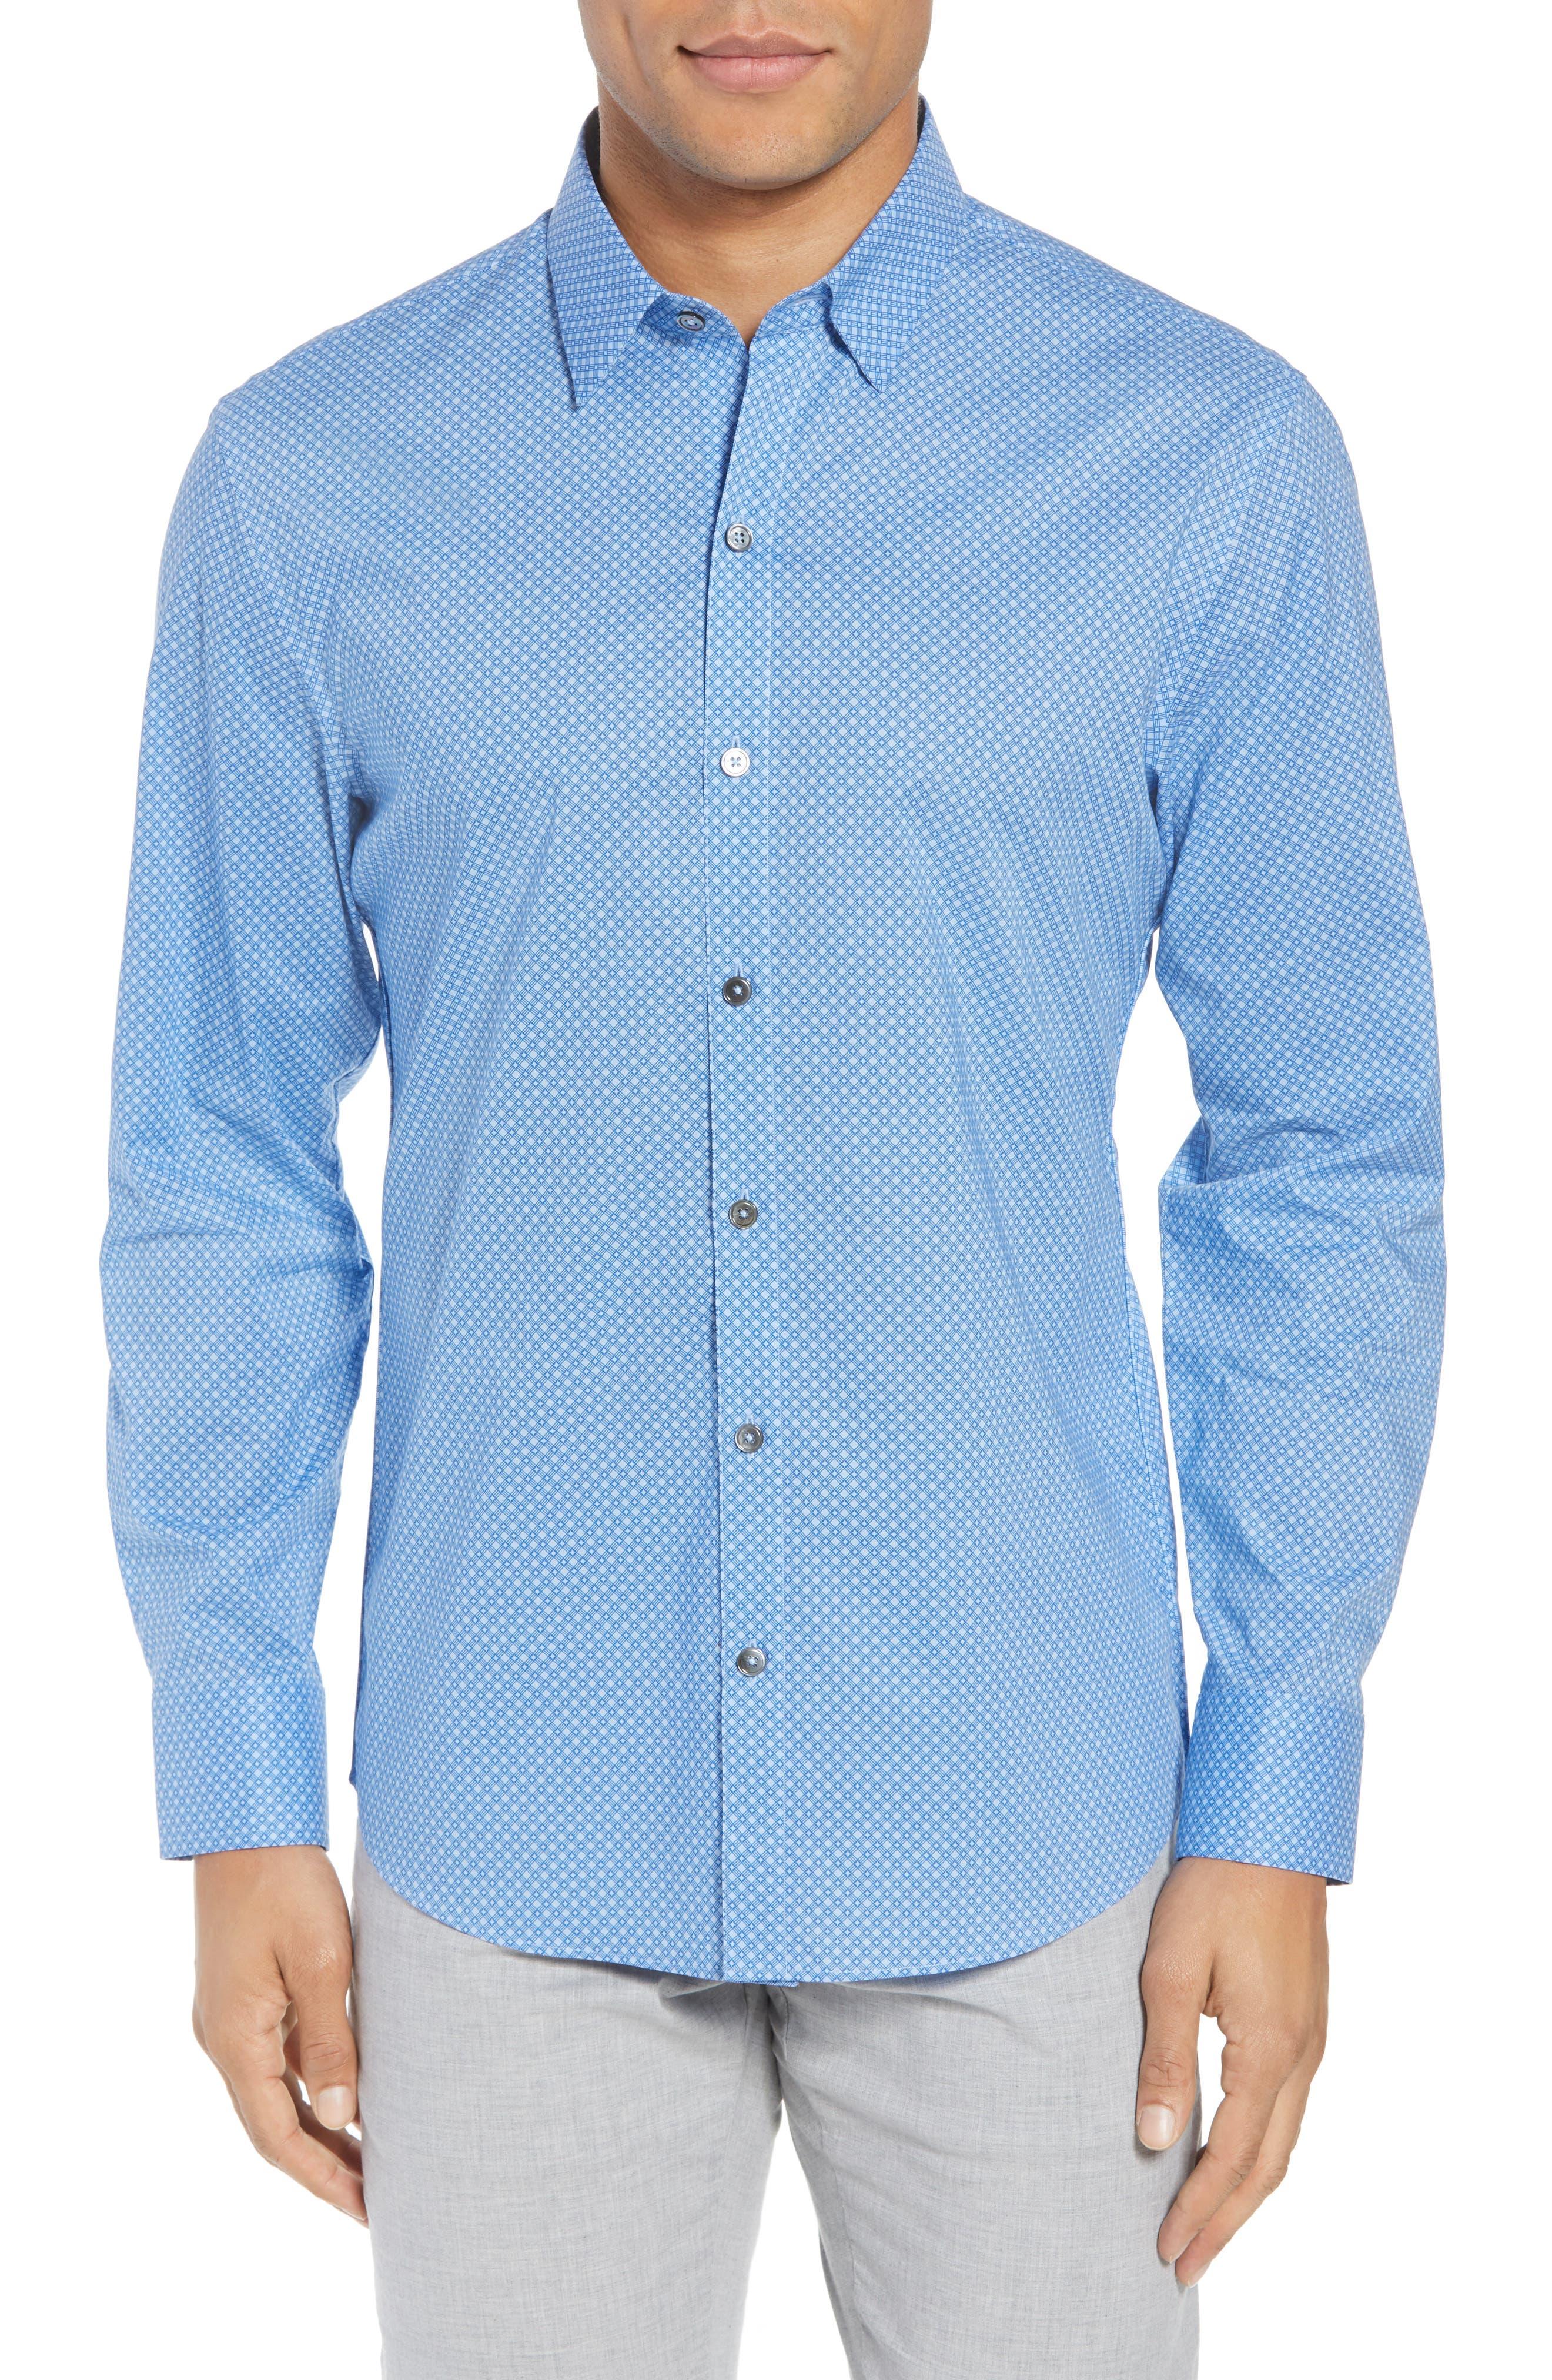 Ethan Slim Fit Sport Shirt,                             Main thumbnail 1, color,                             400